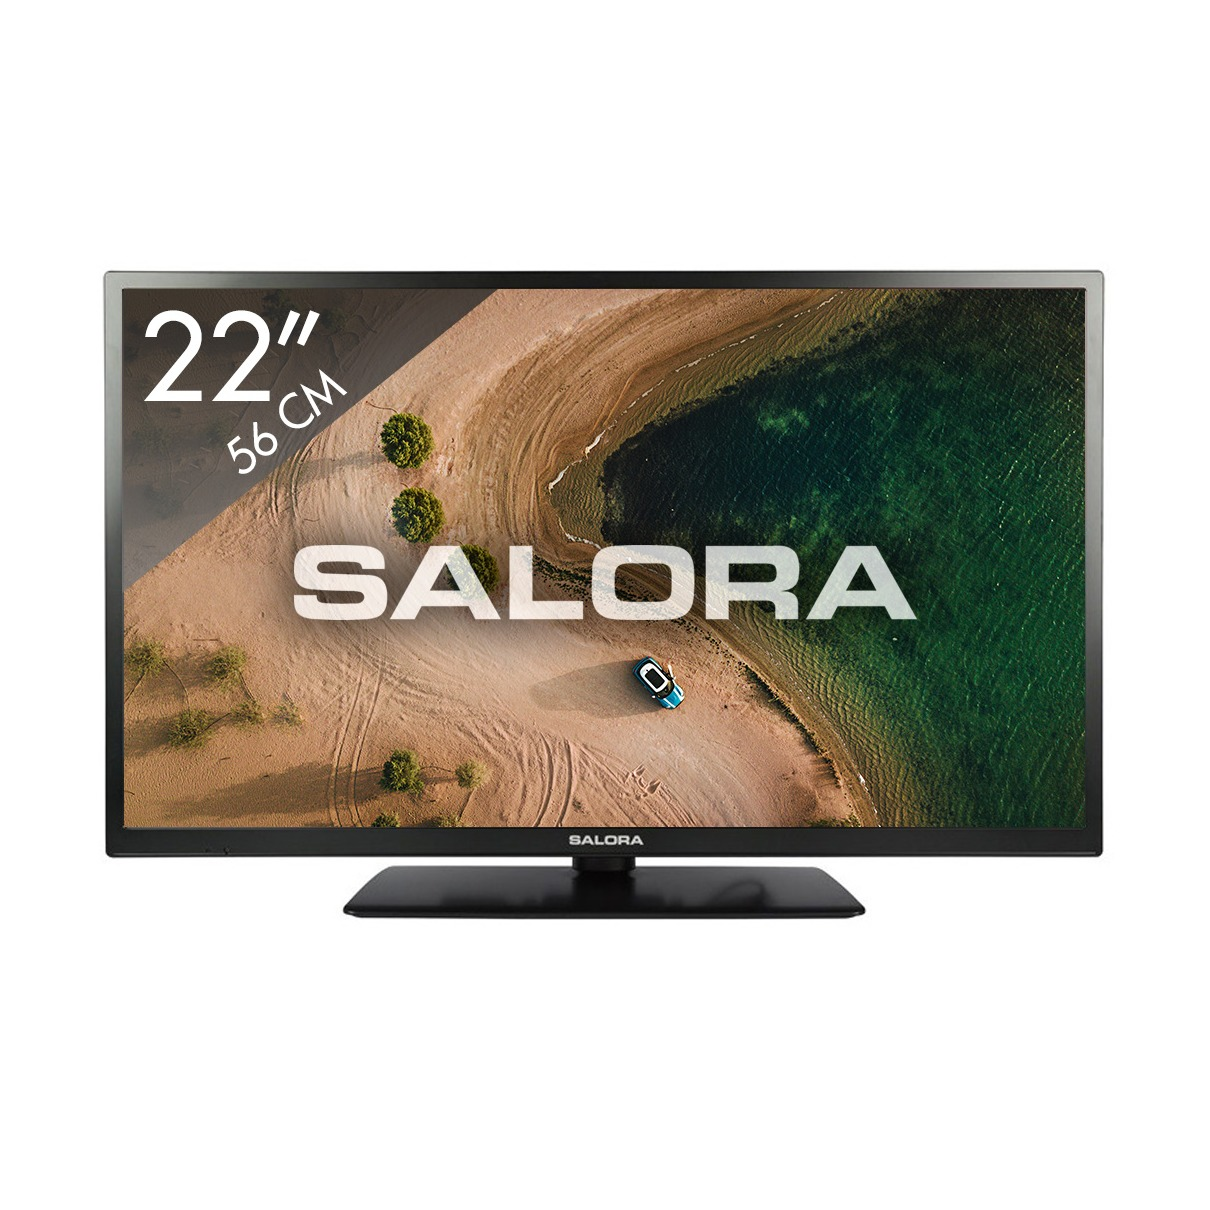 SALORA LED TV 22FSB5002